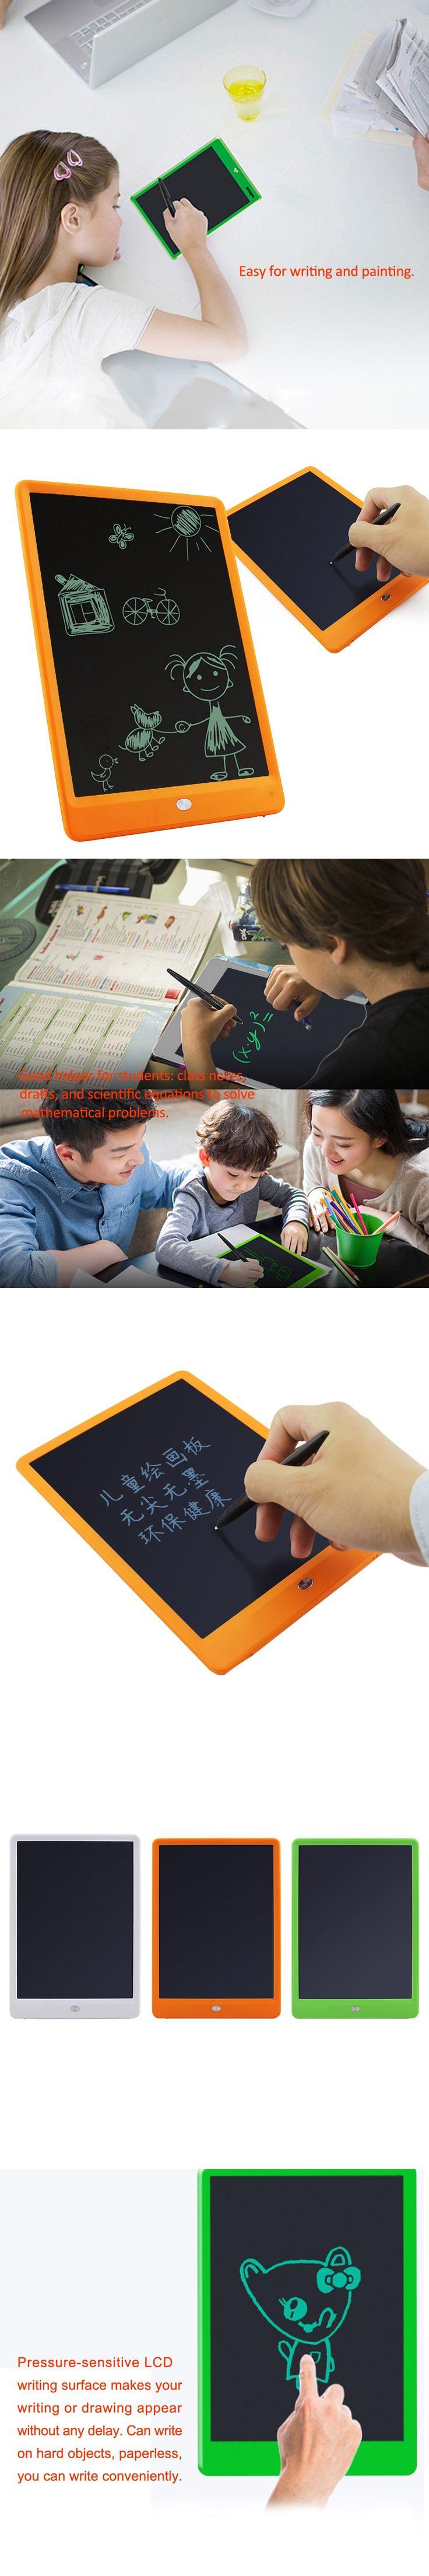 10inch Digital LCD Writing Tablet Ewriter Graffiti Board Handwriting Notepa Drawing Tablet Handwriting Pads Portable No radiatio